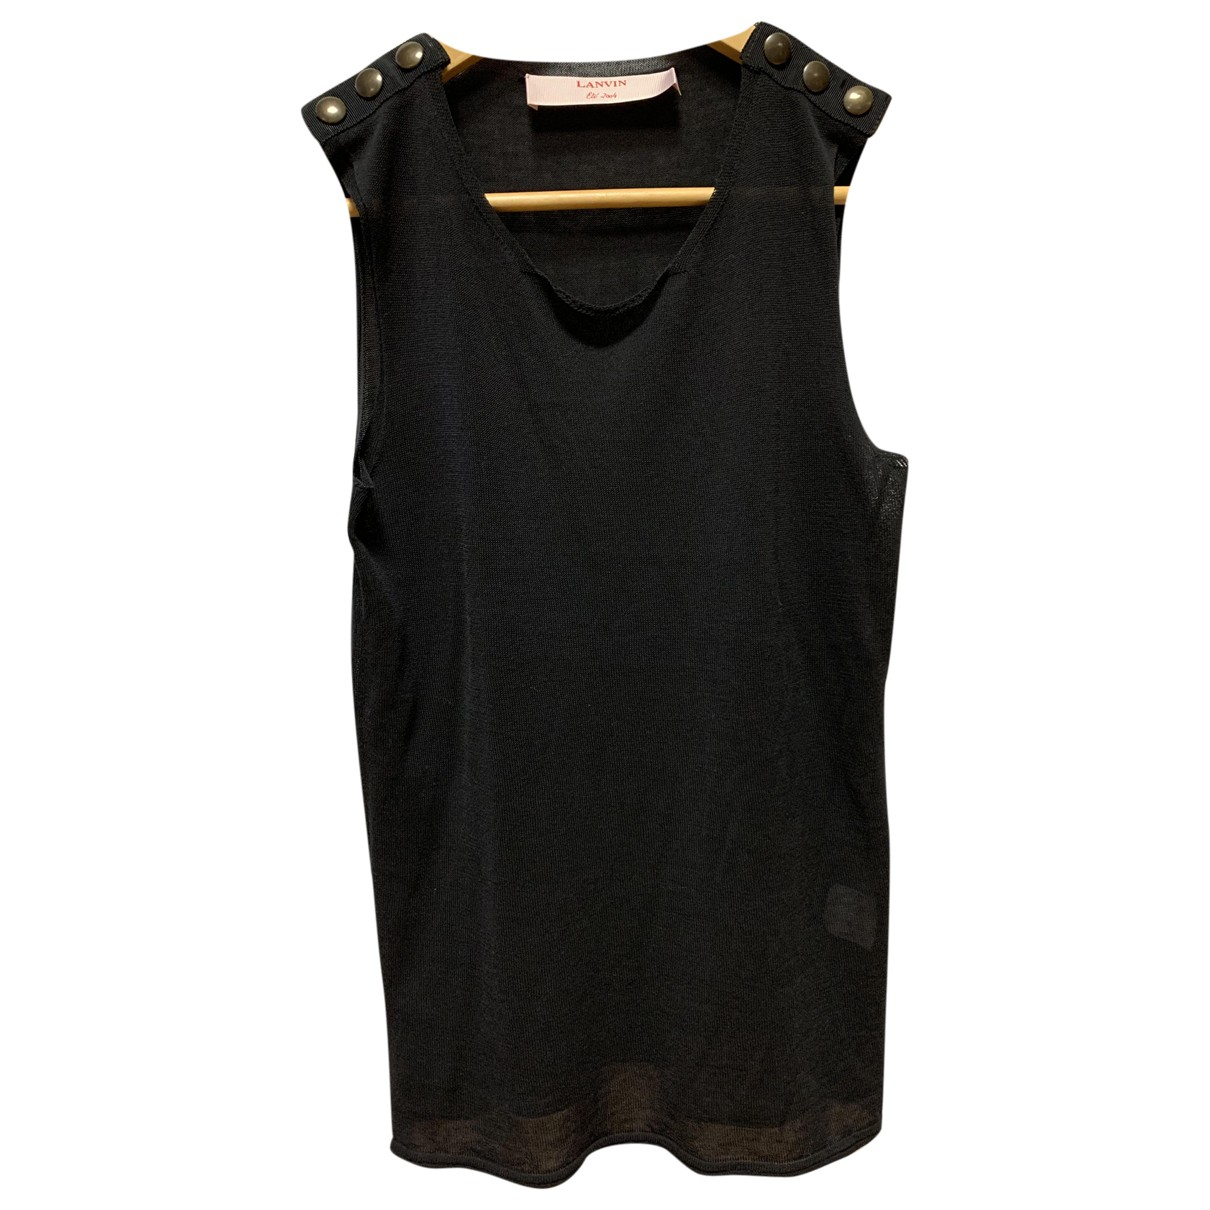 Lanvin \N Black Cotton  top for Women S International